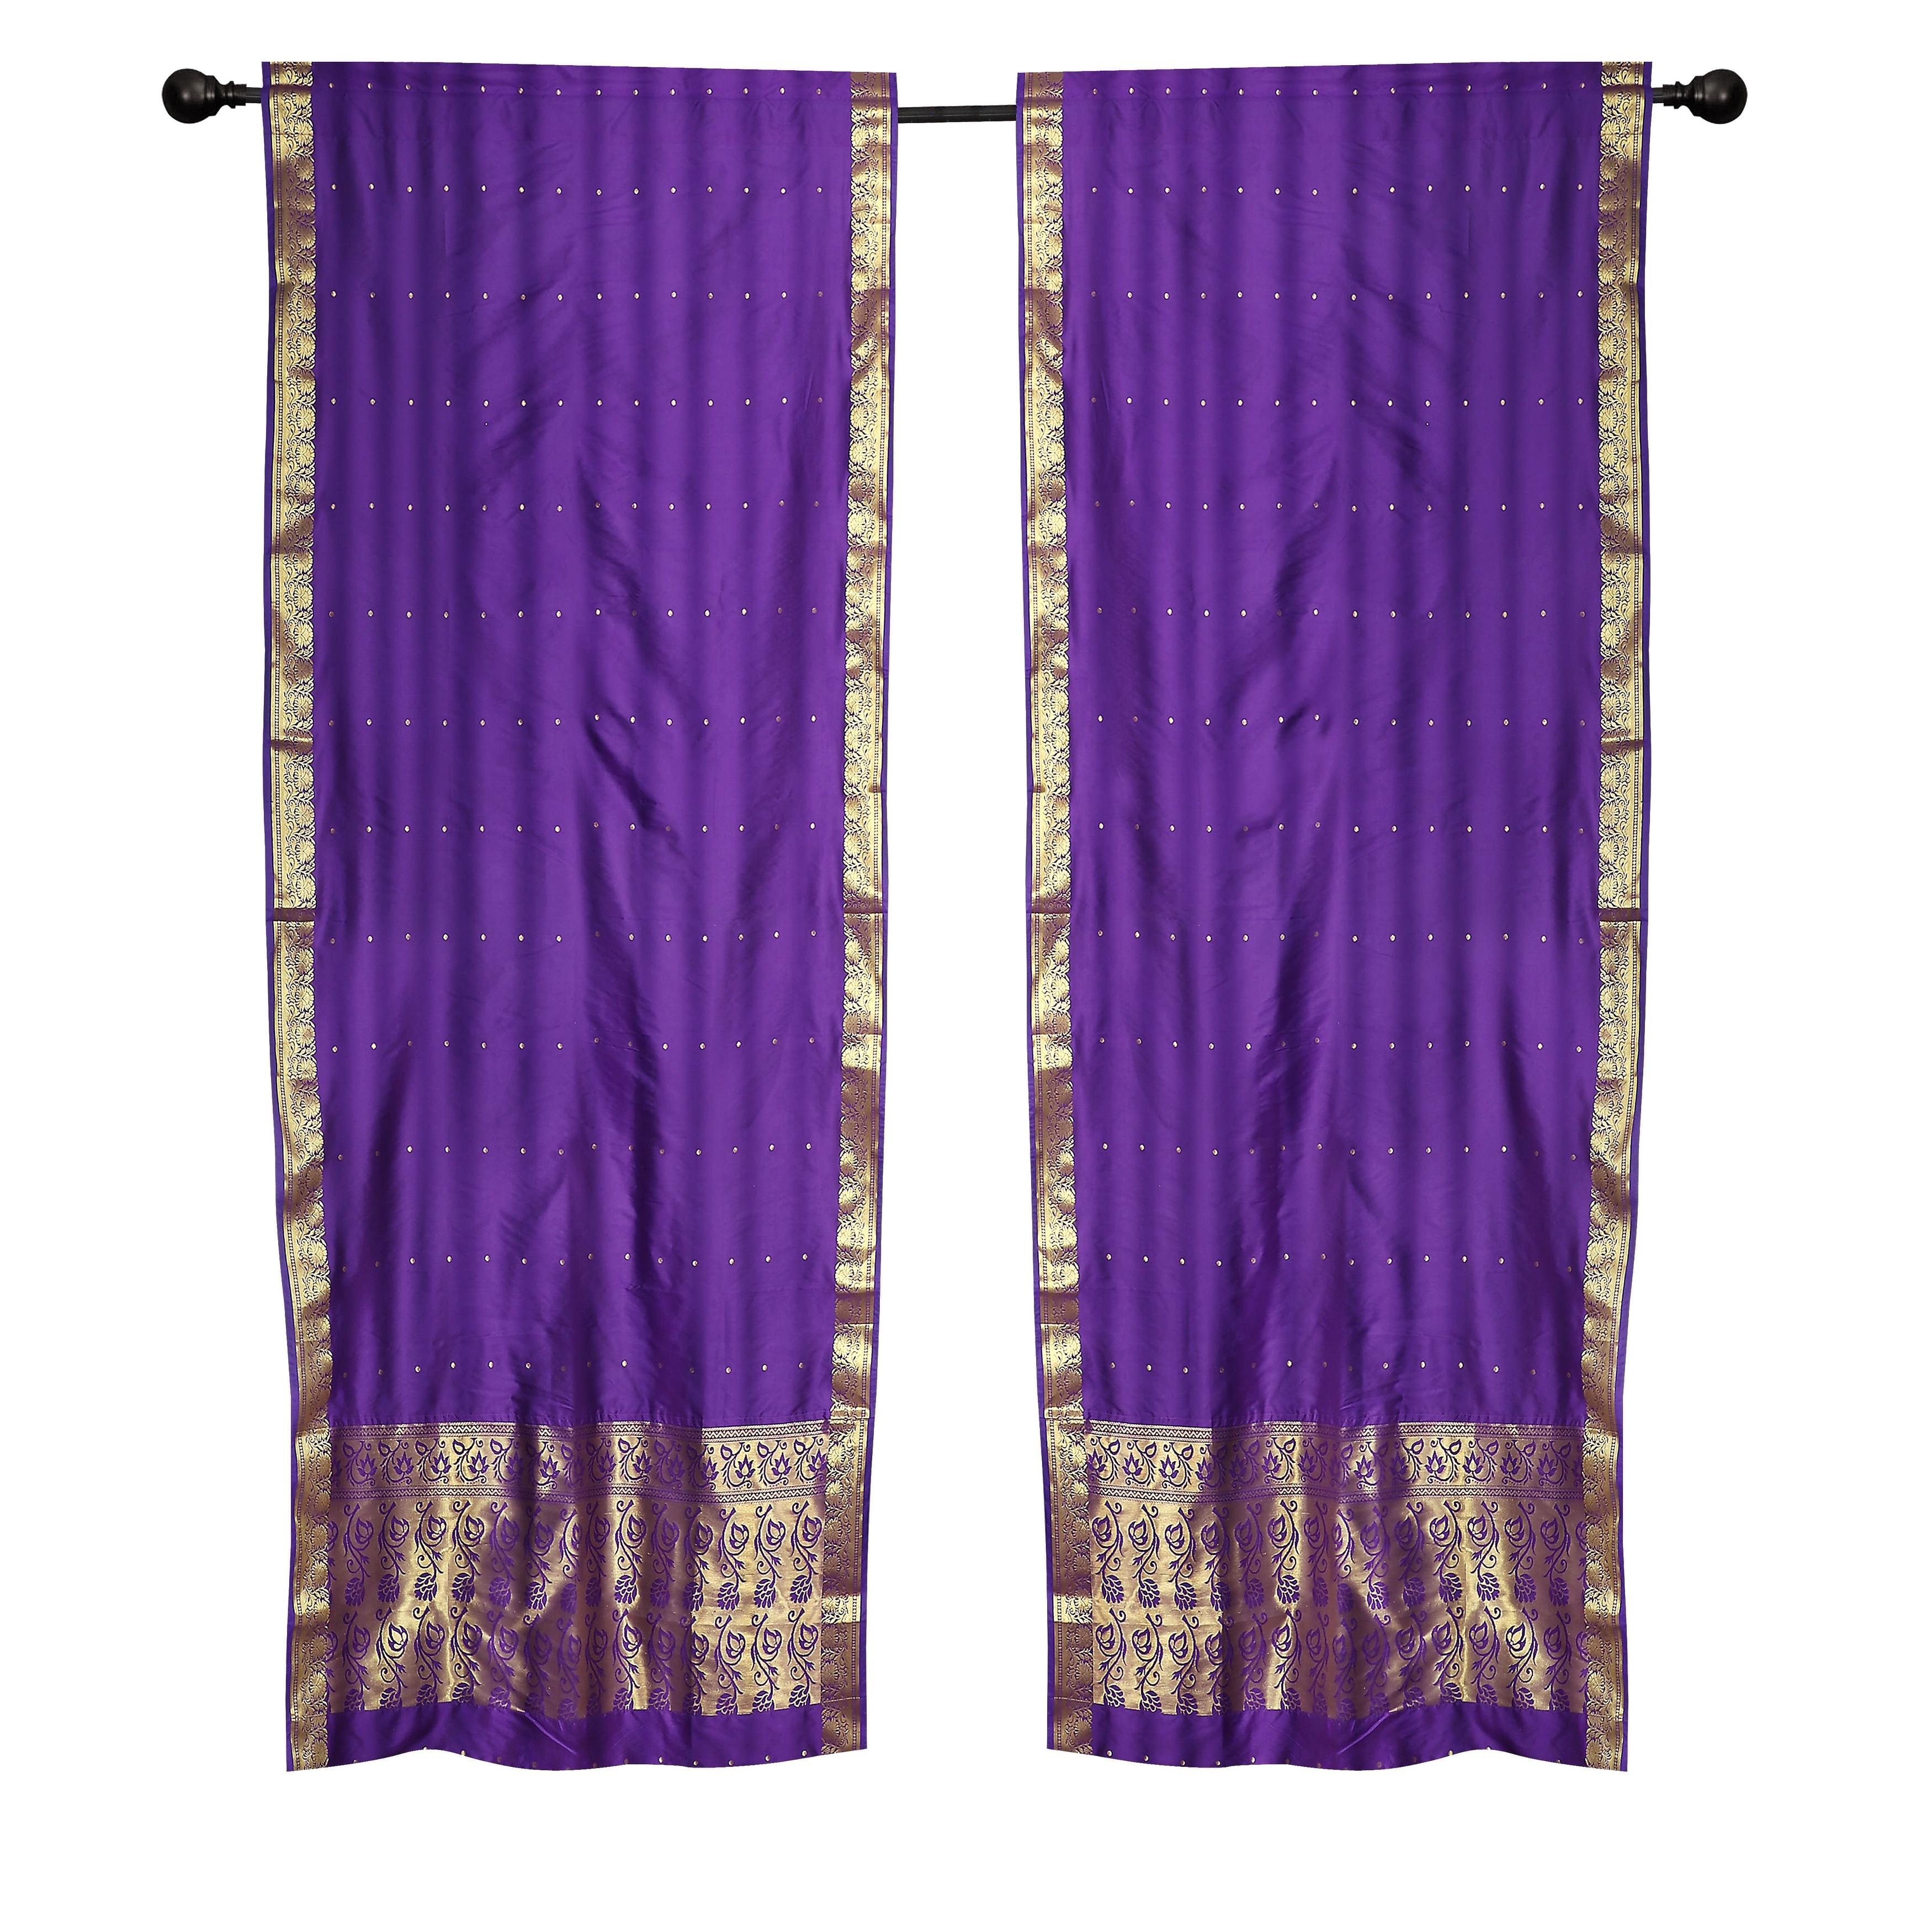 2 Boho Purple Indian Sari Curtains Rod Pocket Window Panels Drapes